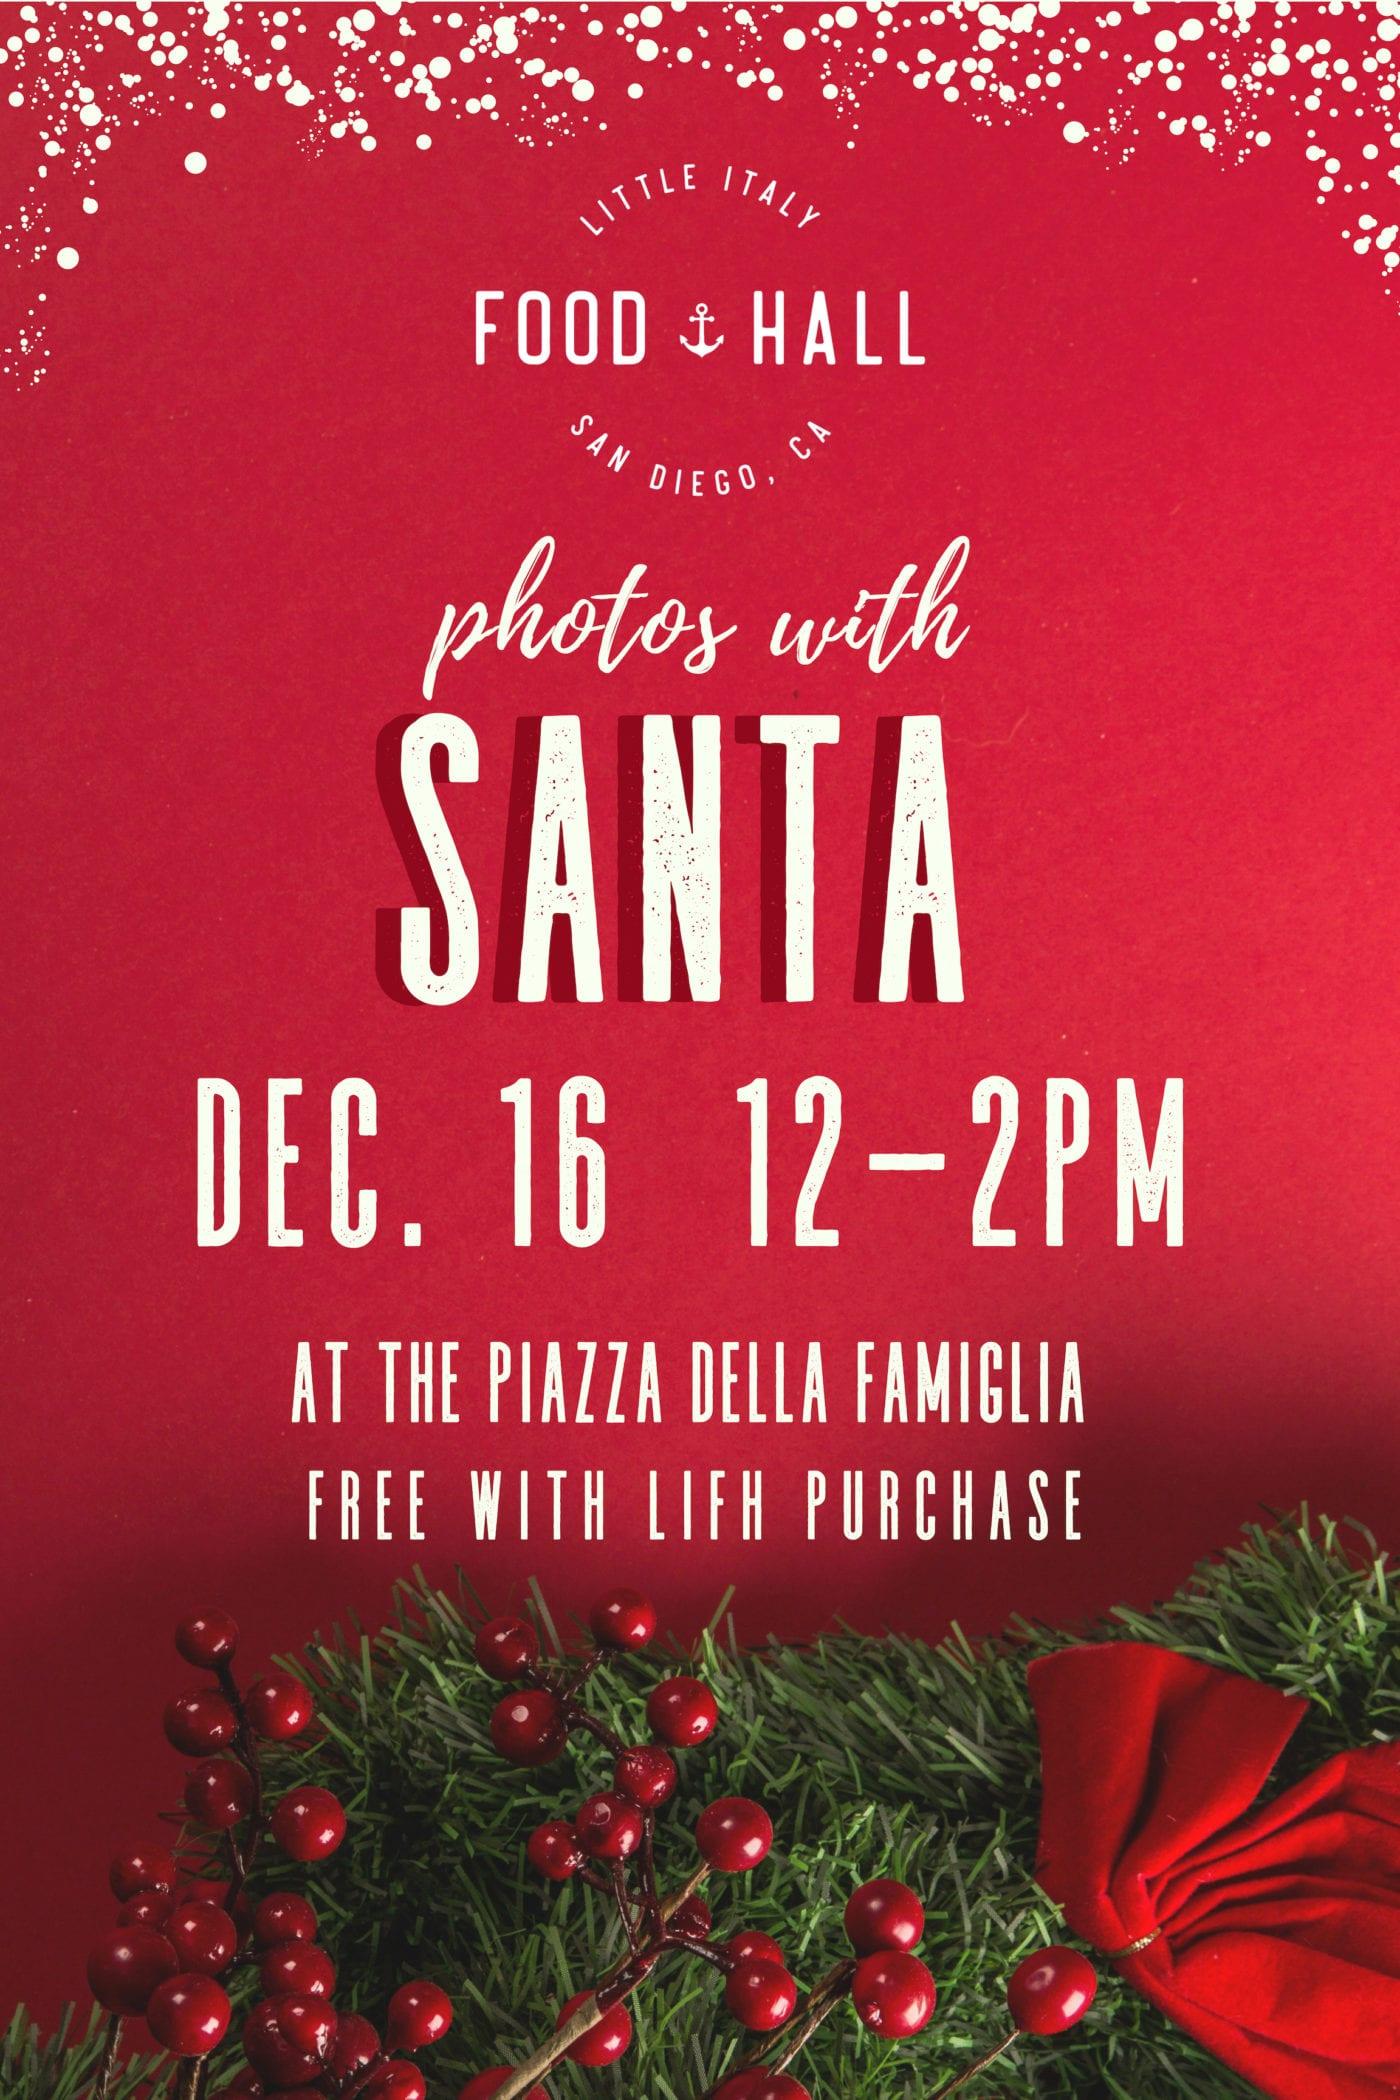 Photos with Santa graphic